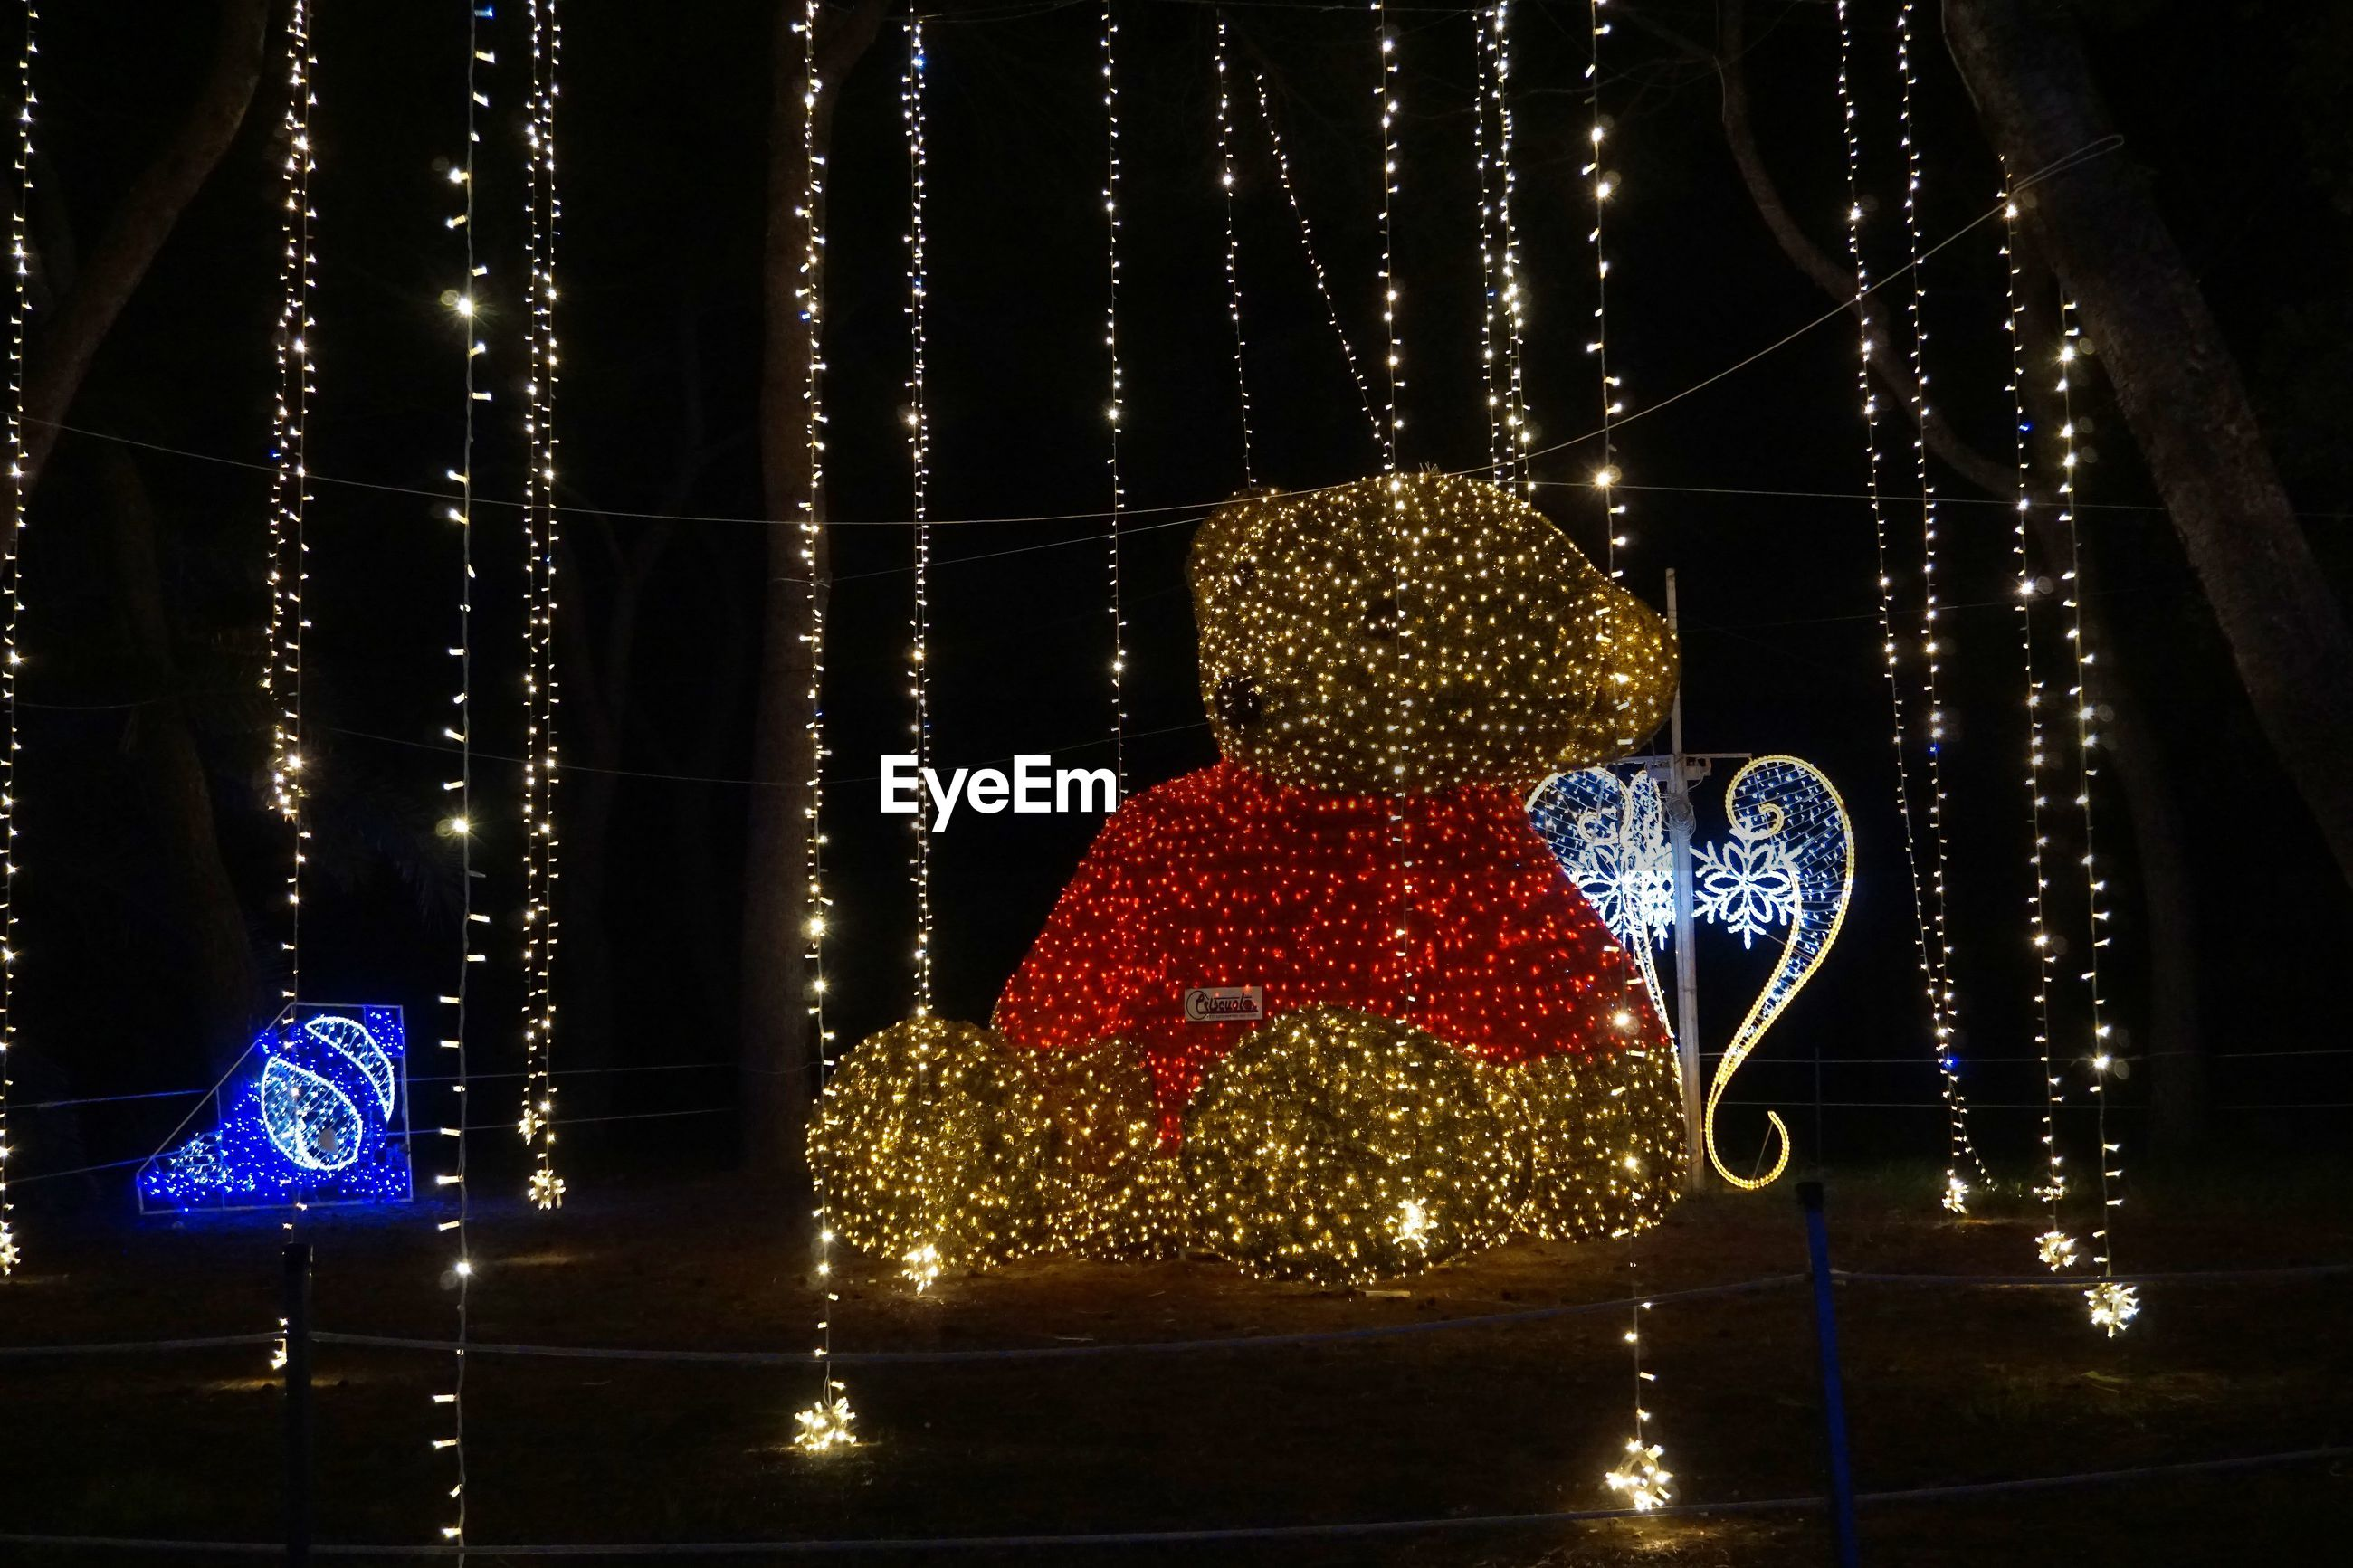 ILLUMINATED CHRISTMAS TREE AT NIGHT DURING FESTIVAL